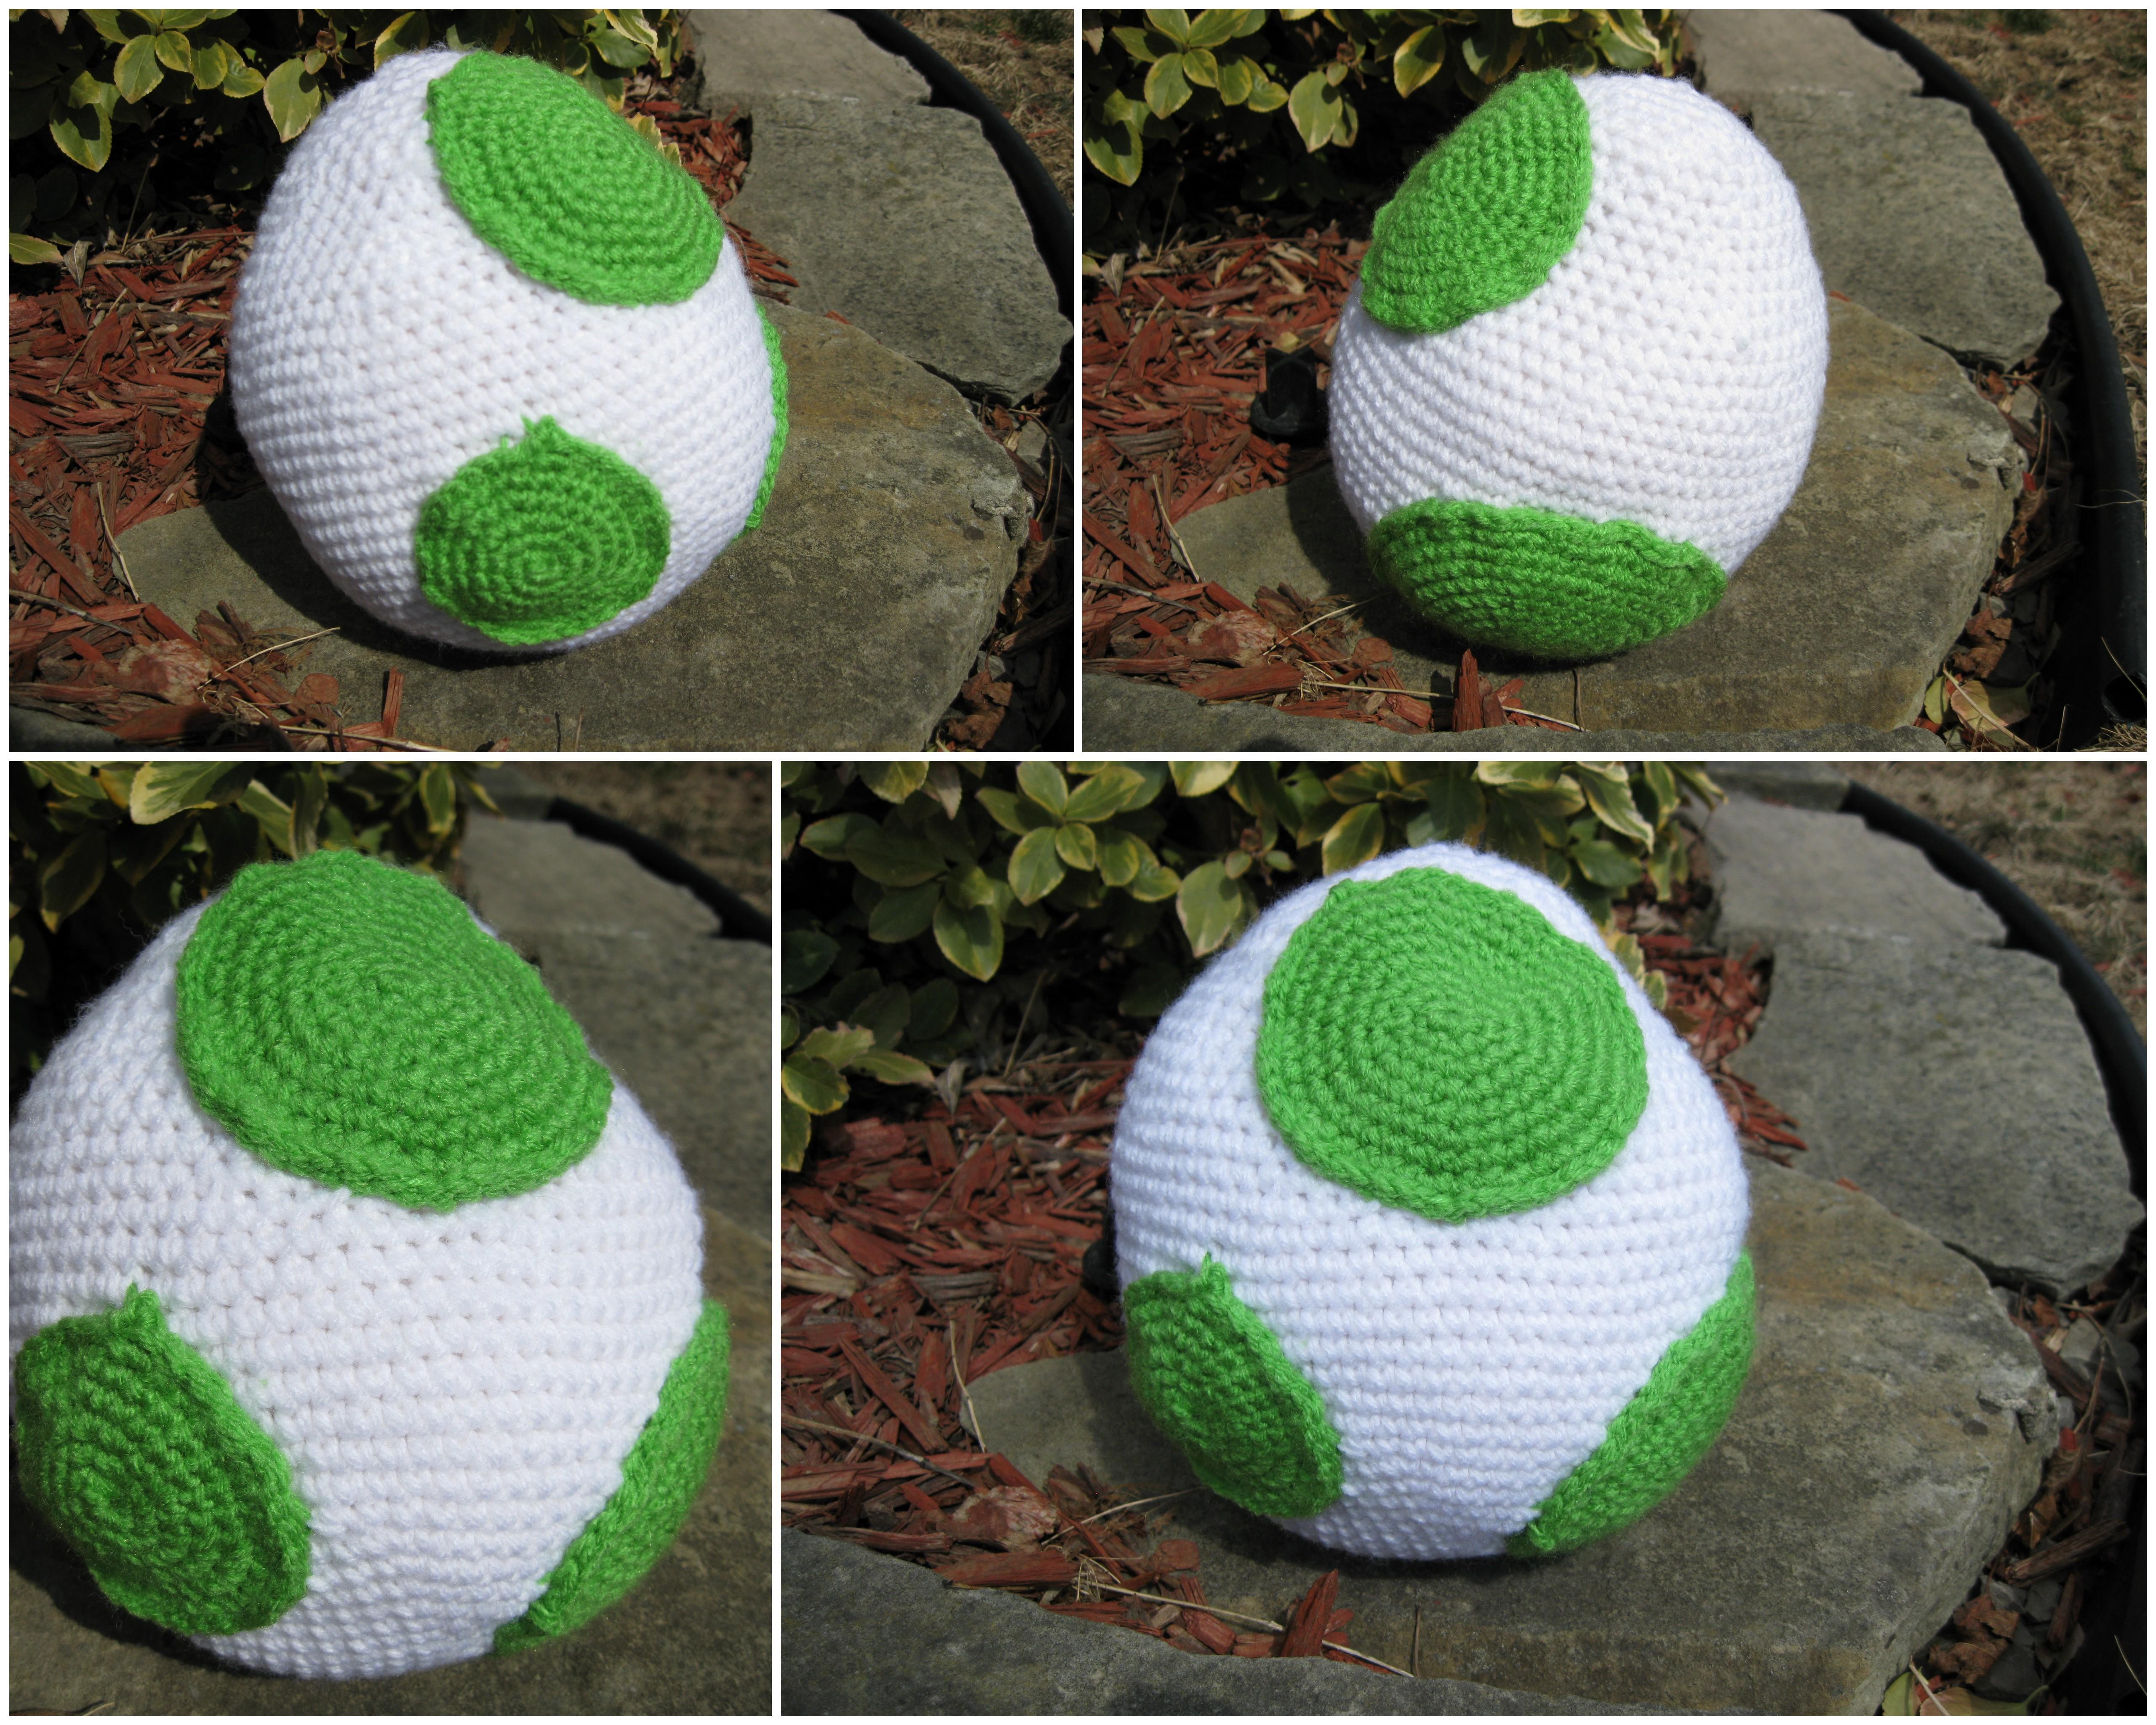 Free Yoshi Egg Crochet Pattern : Large Yoshi Egg Amigurumi Plushi by RTakeshi on DeviantArt